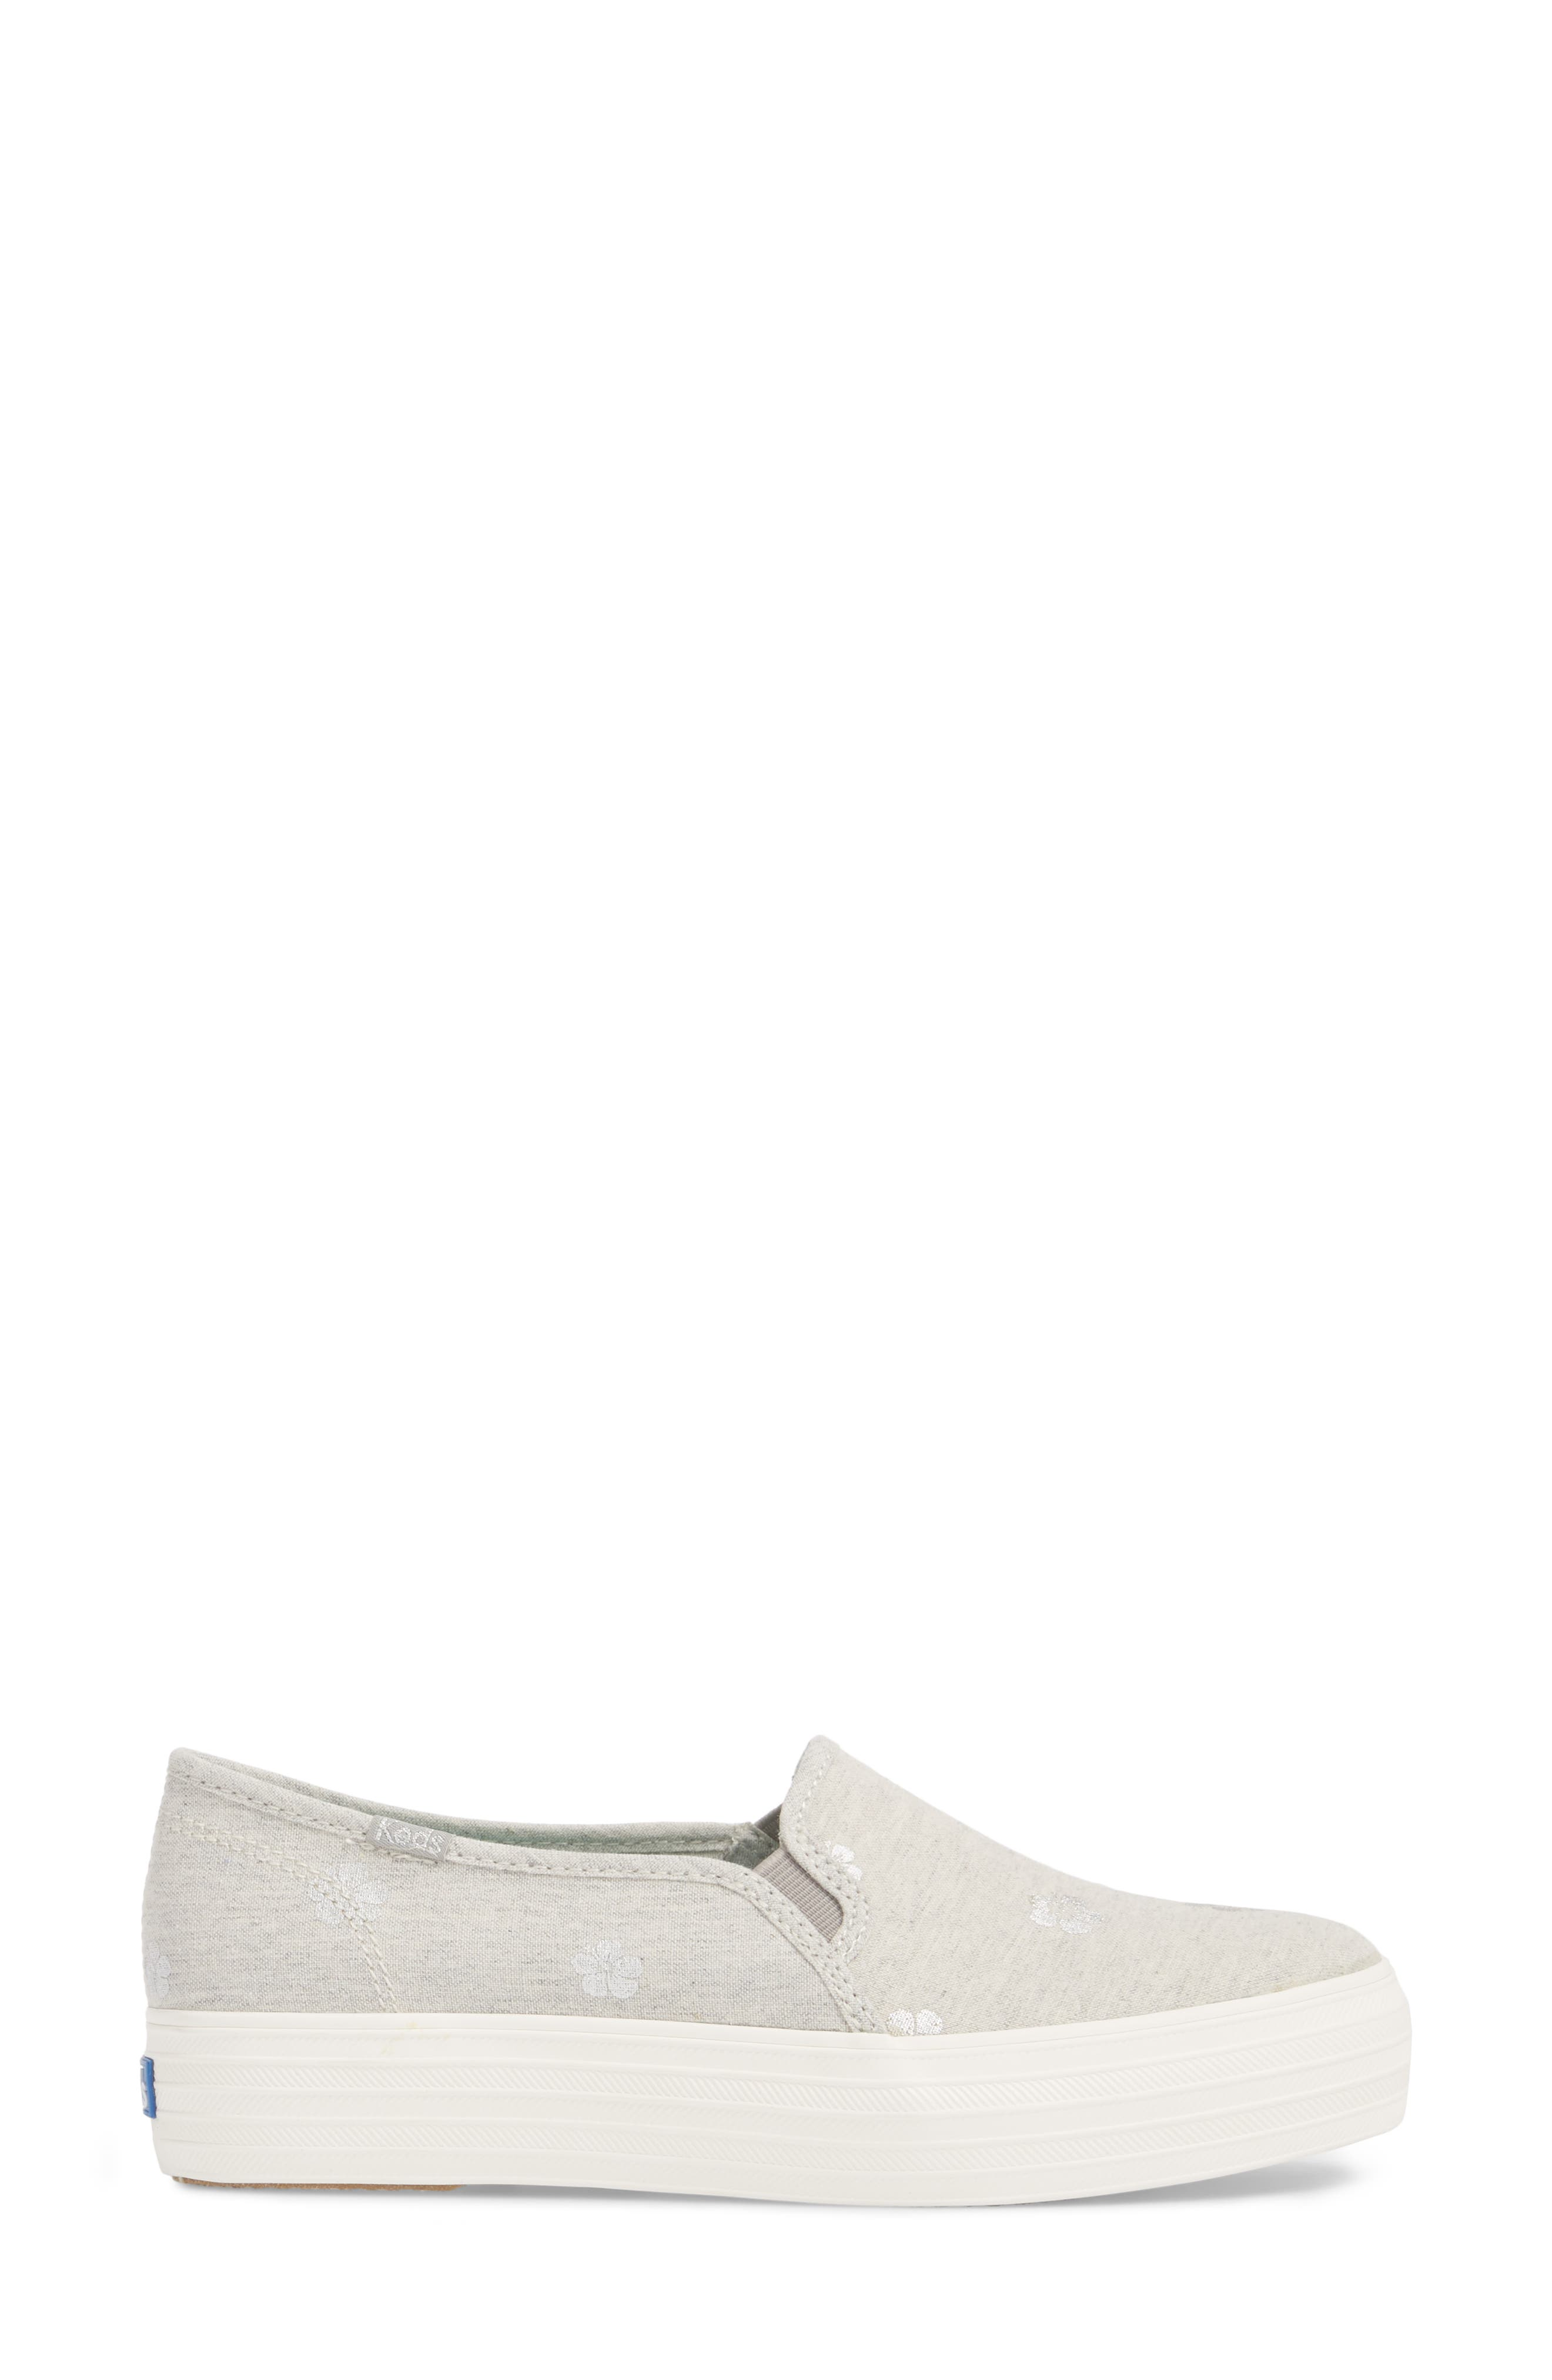 Triple Decker Hibiscus Slip-On Platform Sneaker,                             Alternate thumbnail 3, color,                             Light Grey